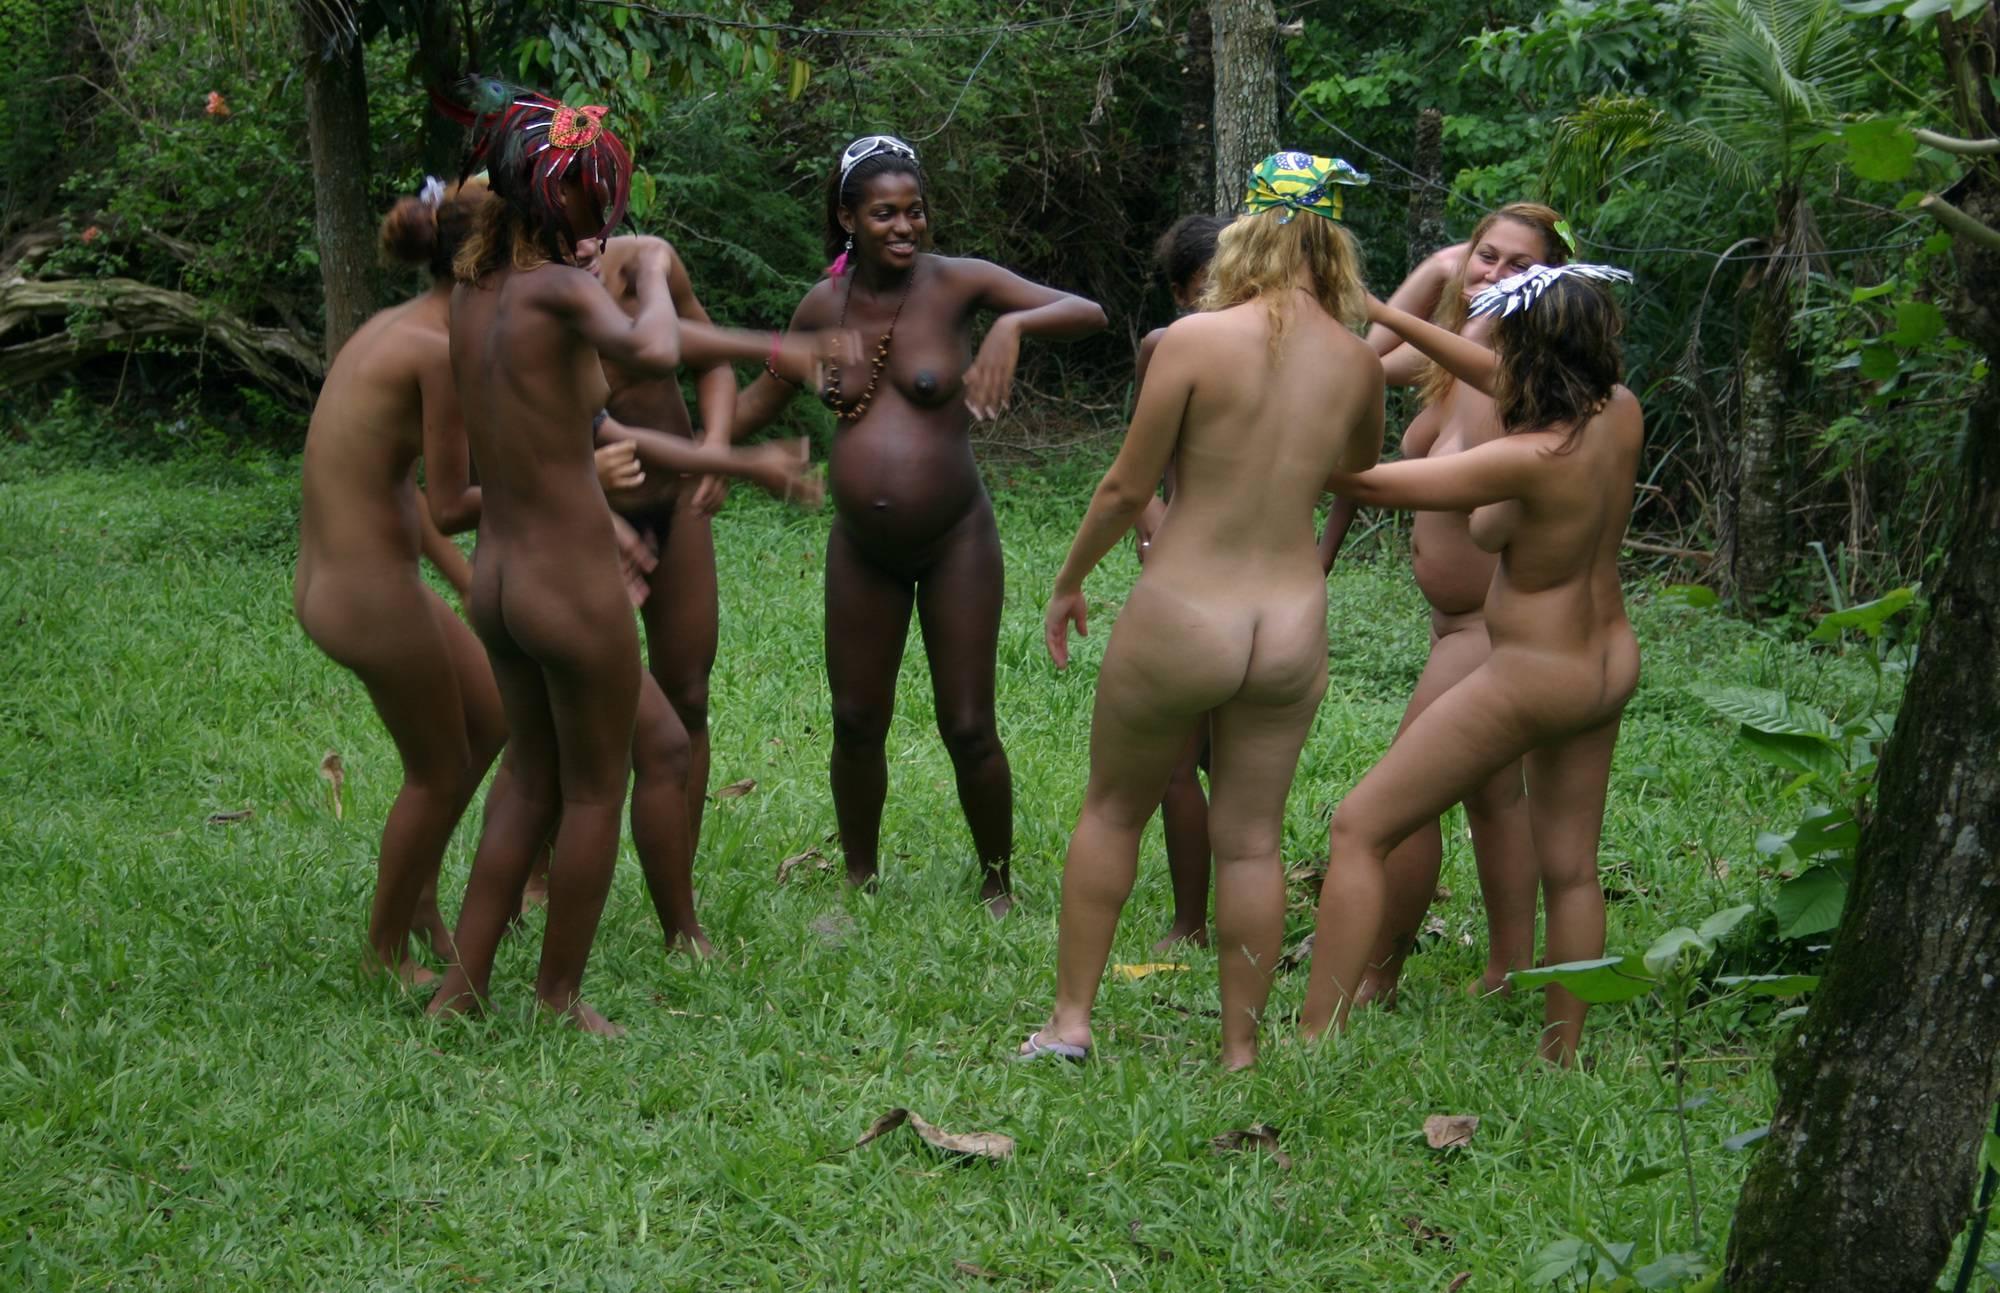 Brazilian Monkey Hat Girls - 1